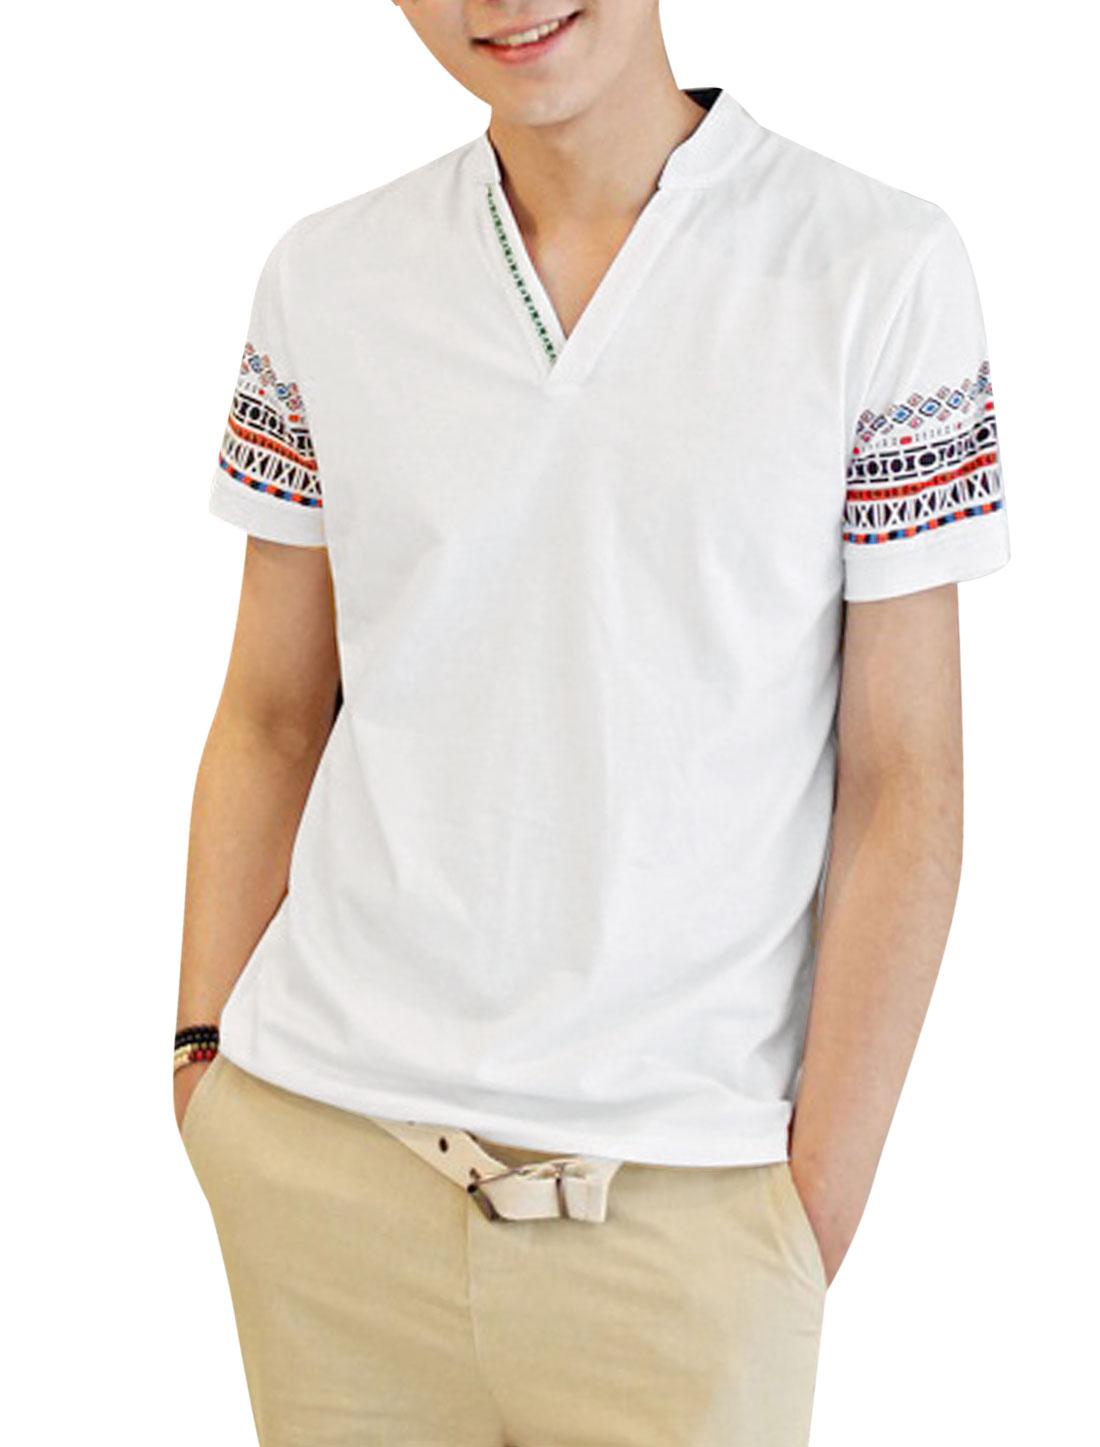 Men Cozy Fit Mandarin Collar Geometric Prints Top Shirt White S